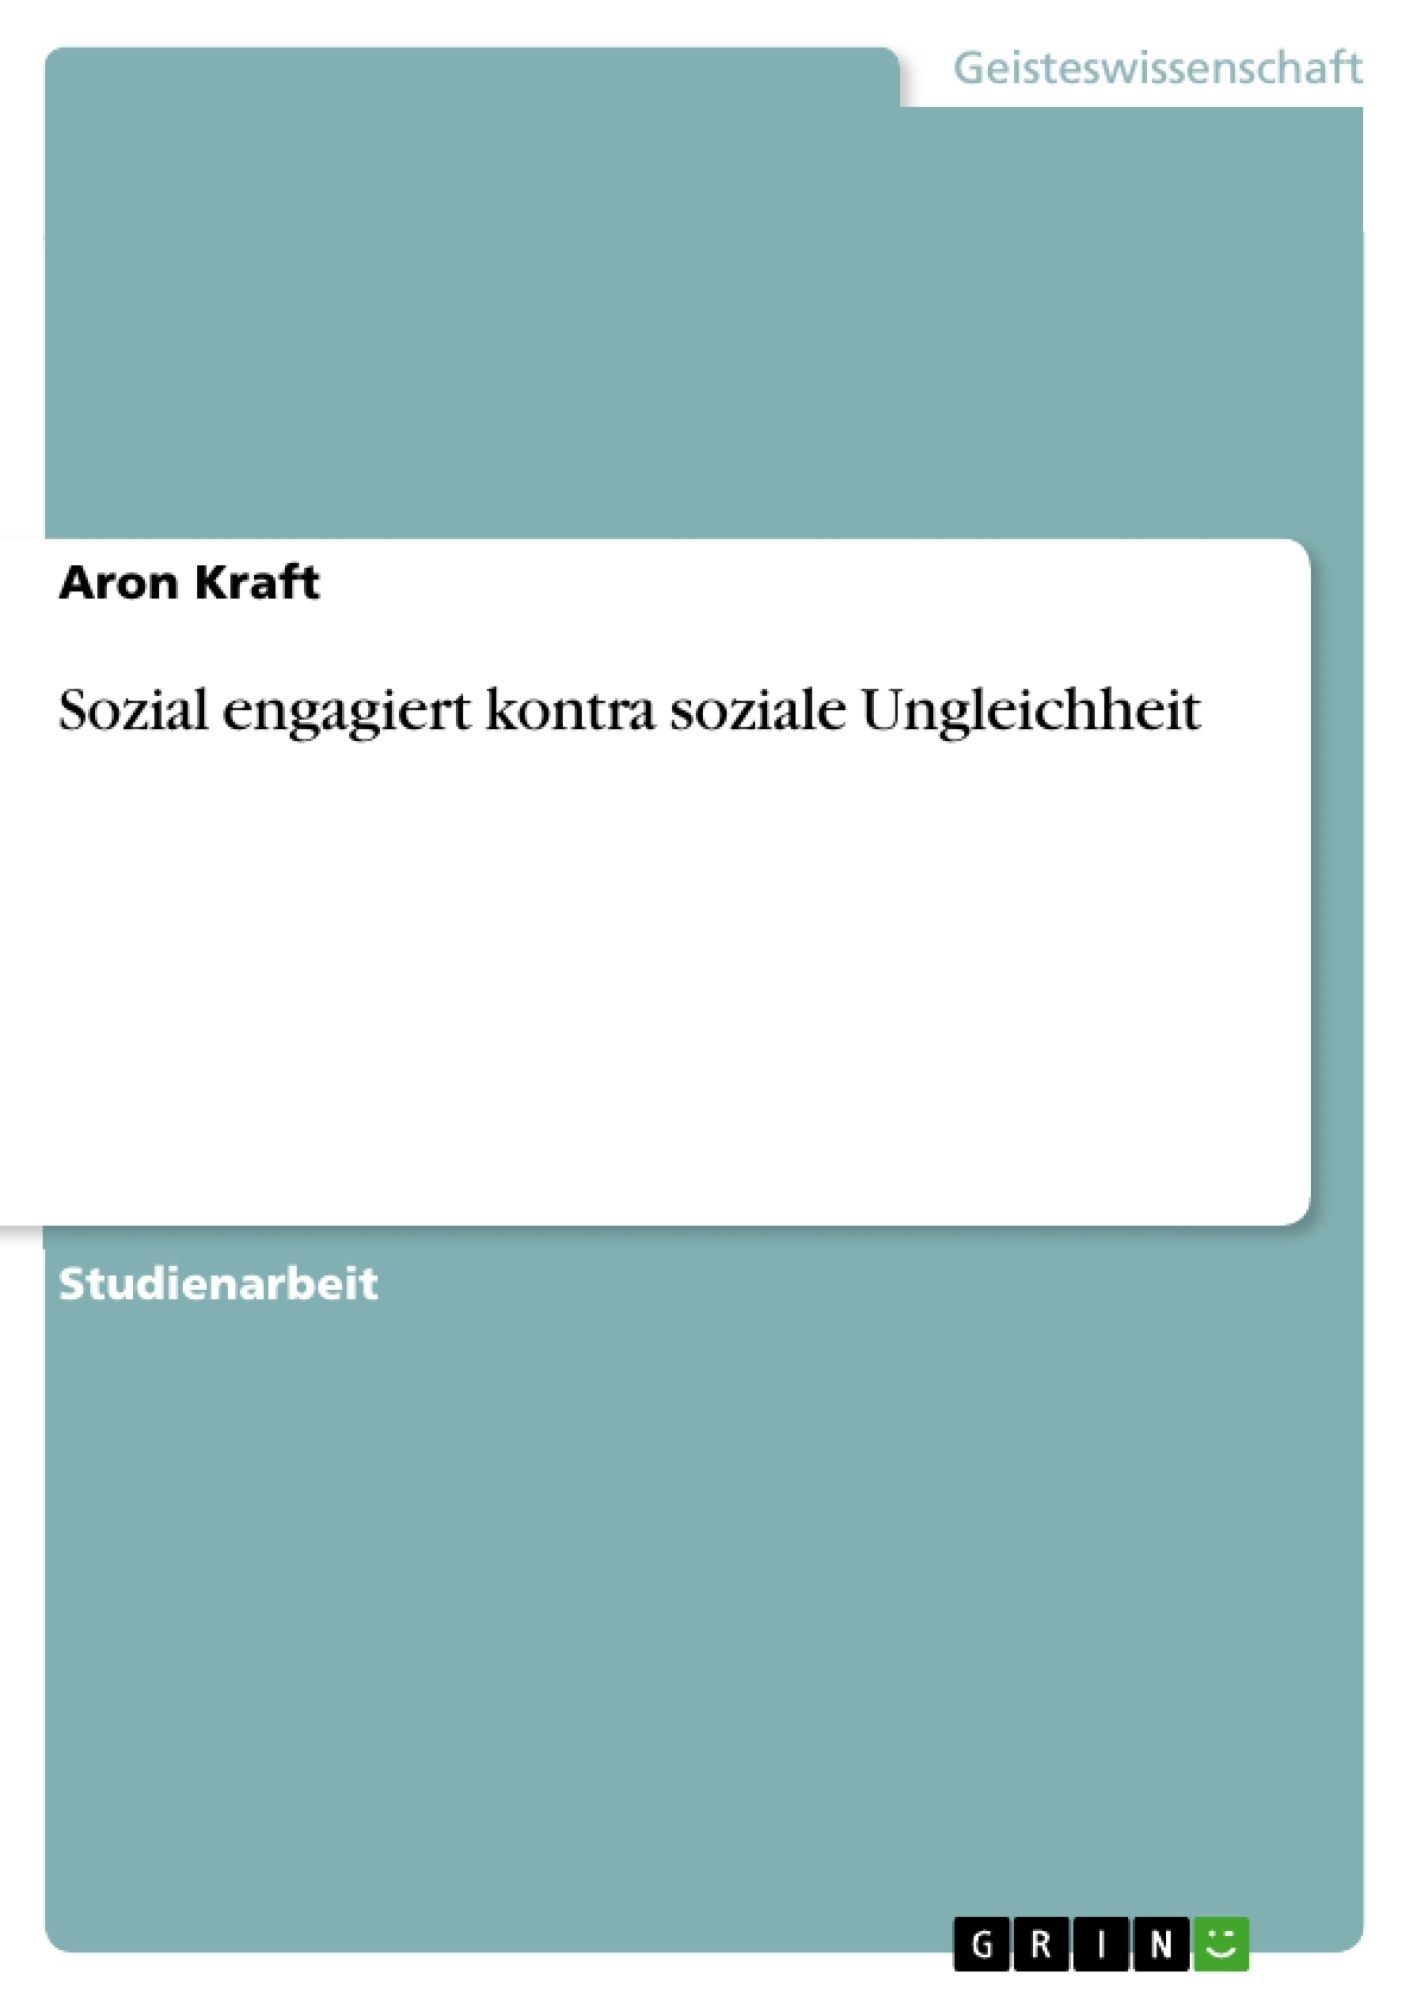 Titel: Sozial engagiert kontra soziale Ungleichheit